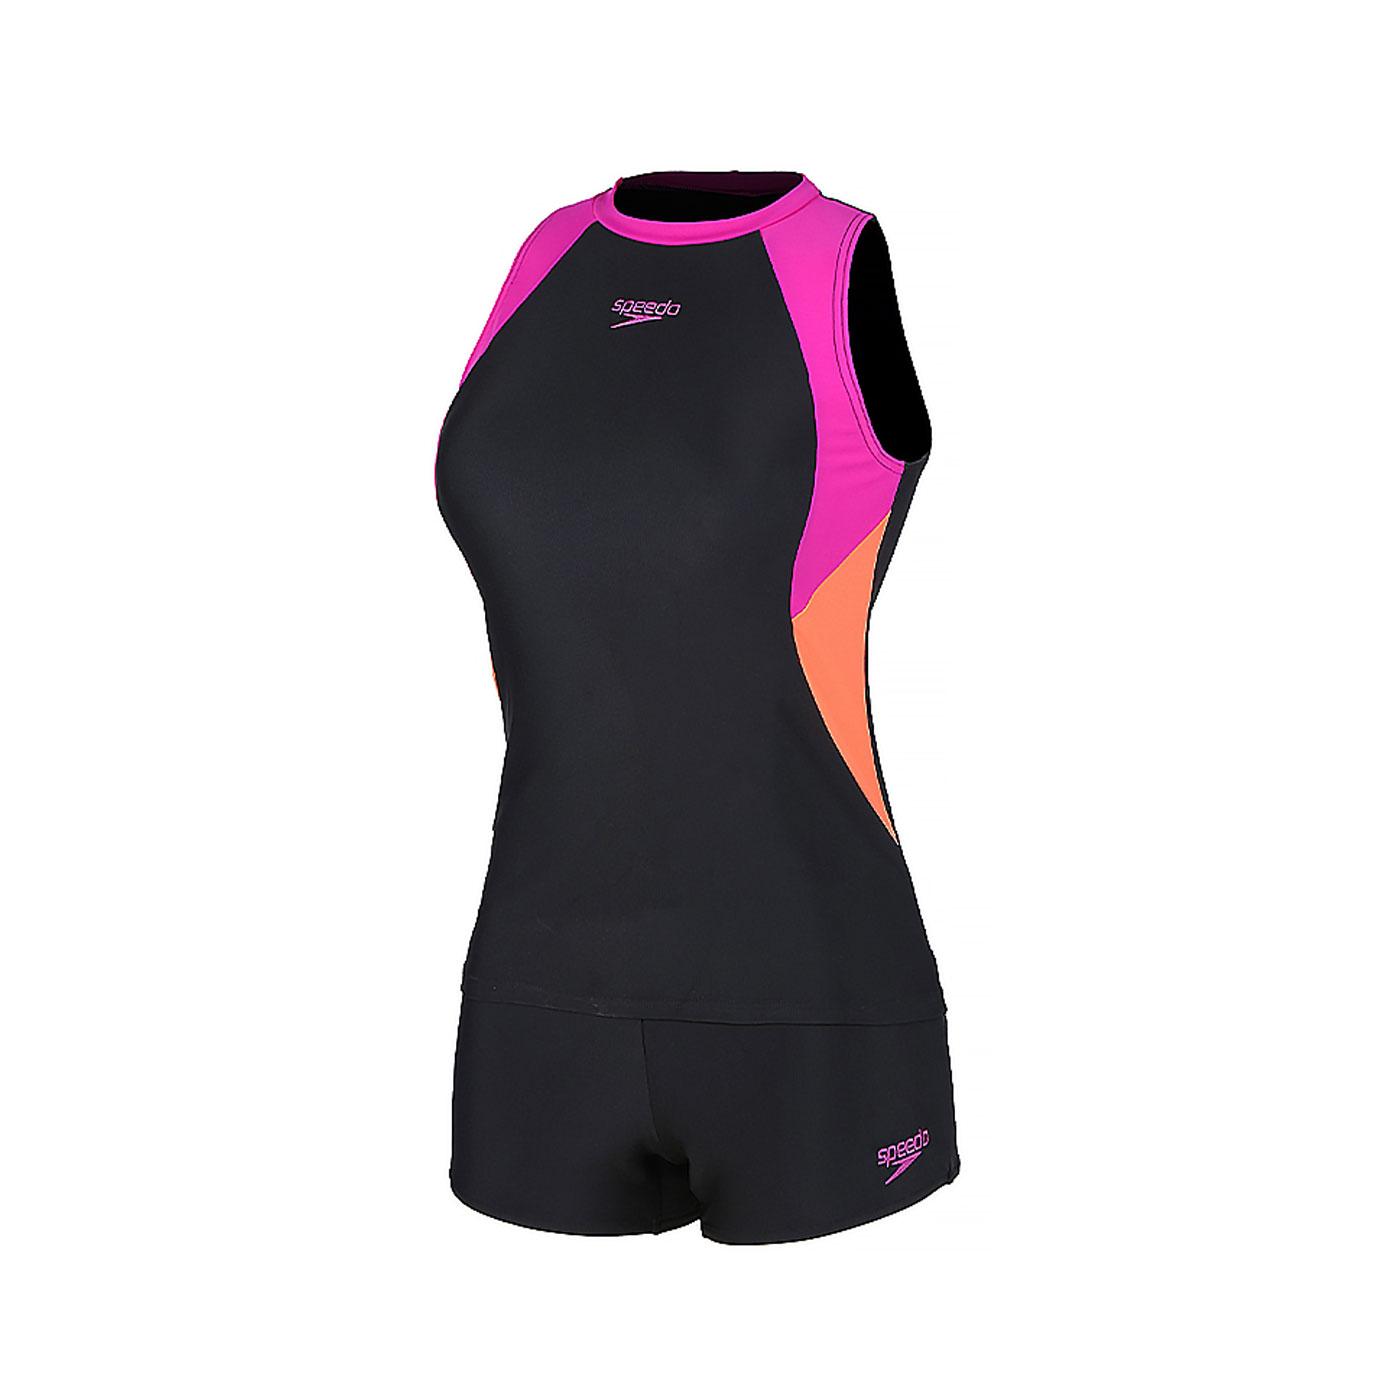 SPEEDO 女款運動兩截式泳裝 SD812945G077 - 黑橘紫